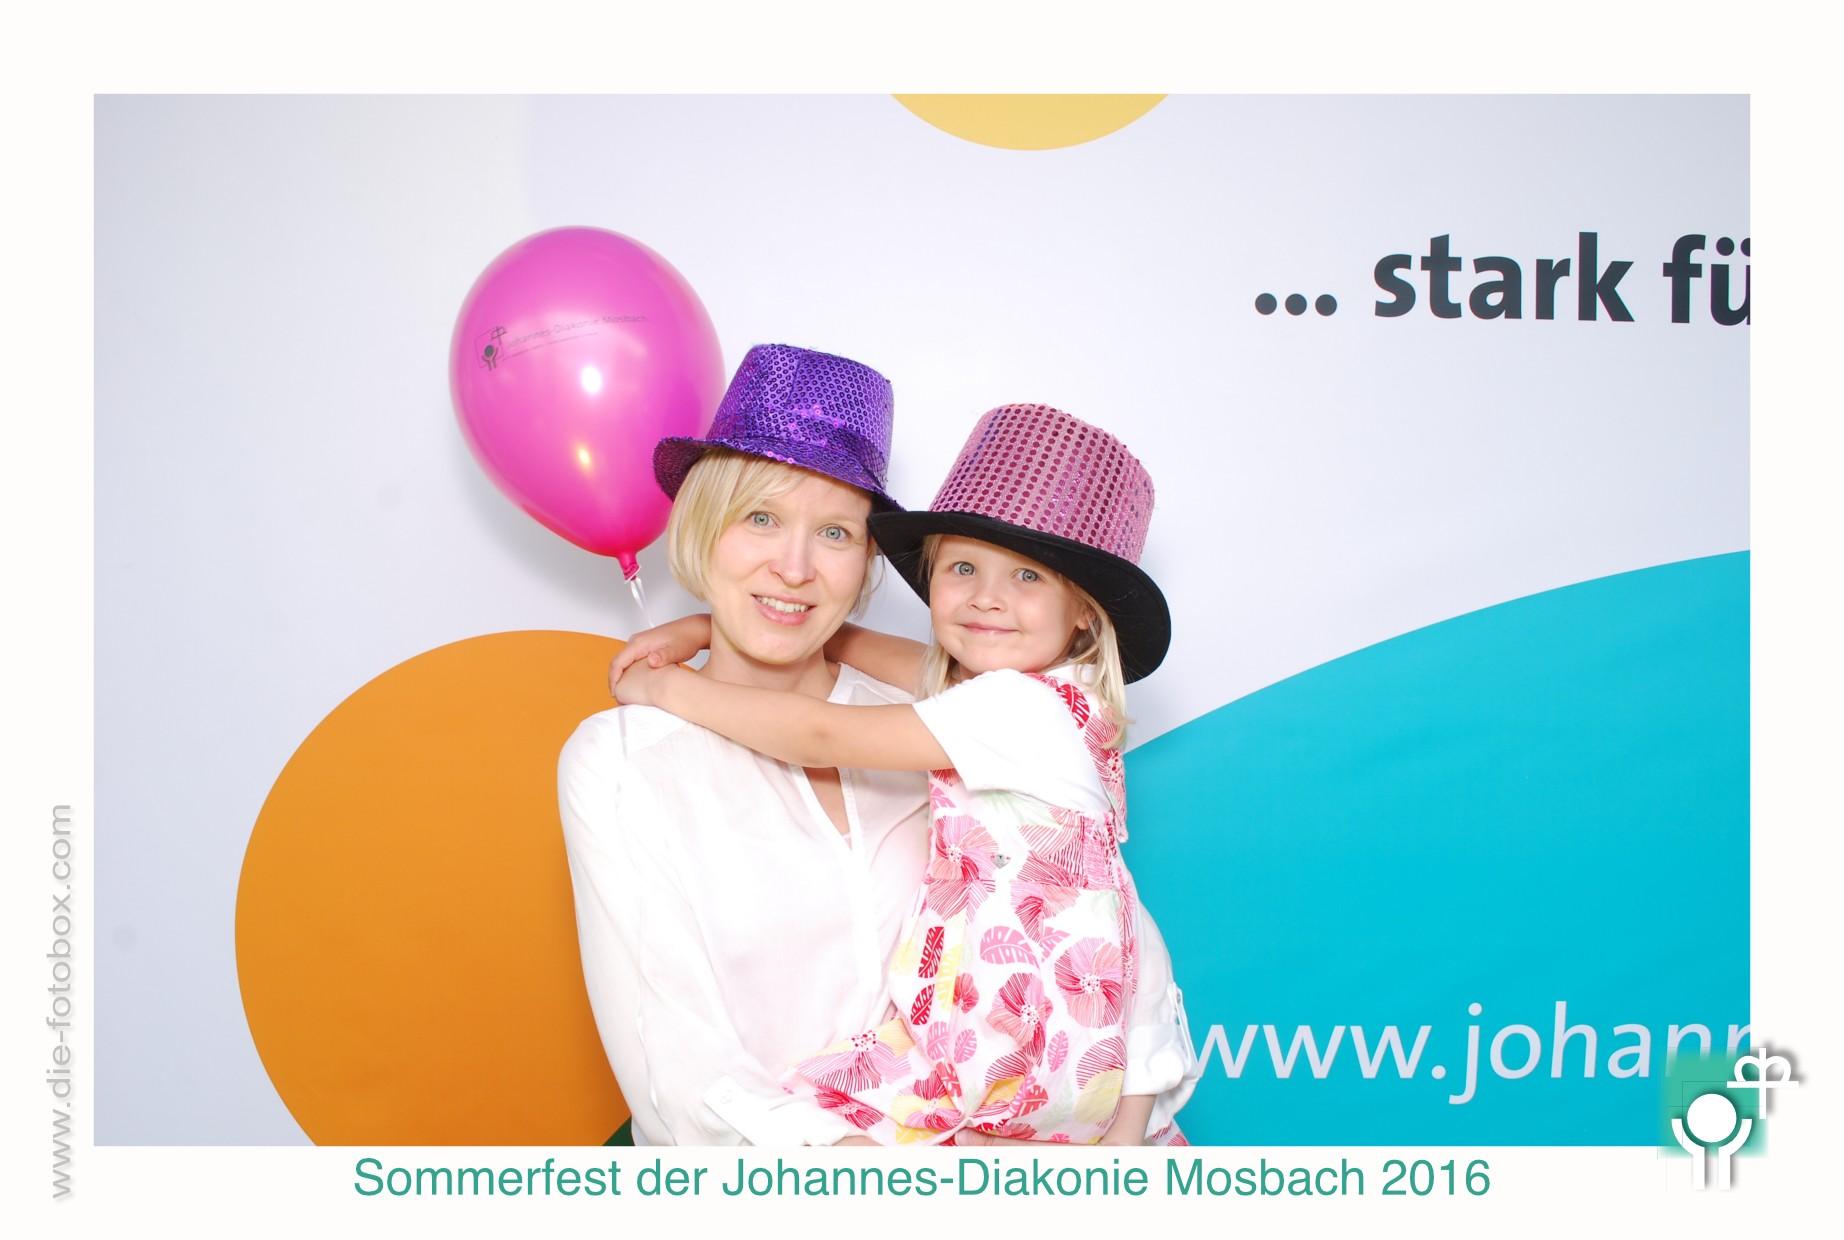 2016-06-26-Sommerfest-Johannes-Diakonie-195